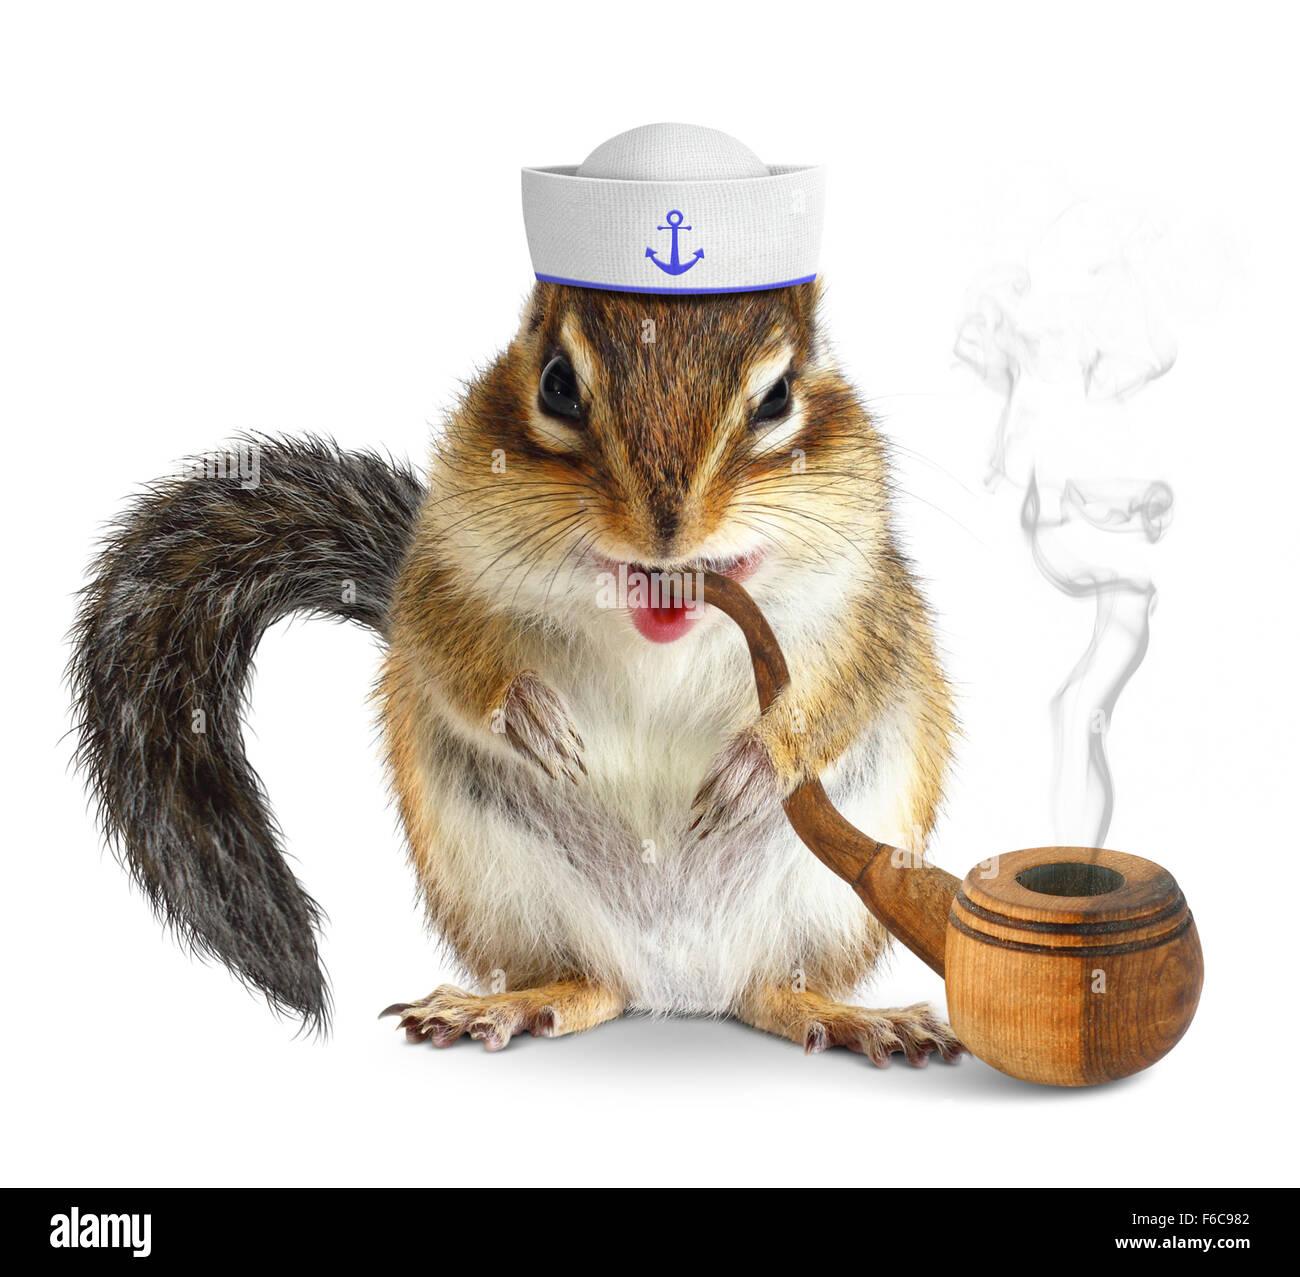 Funny Animal Sailor Stockfotos & Funny Animal Sailor Bilder - Alamy